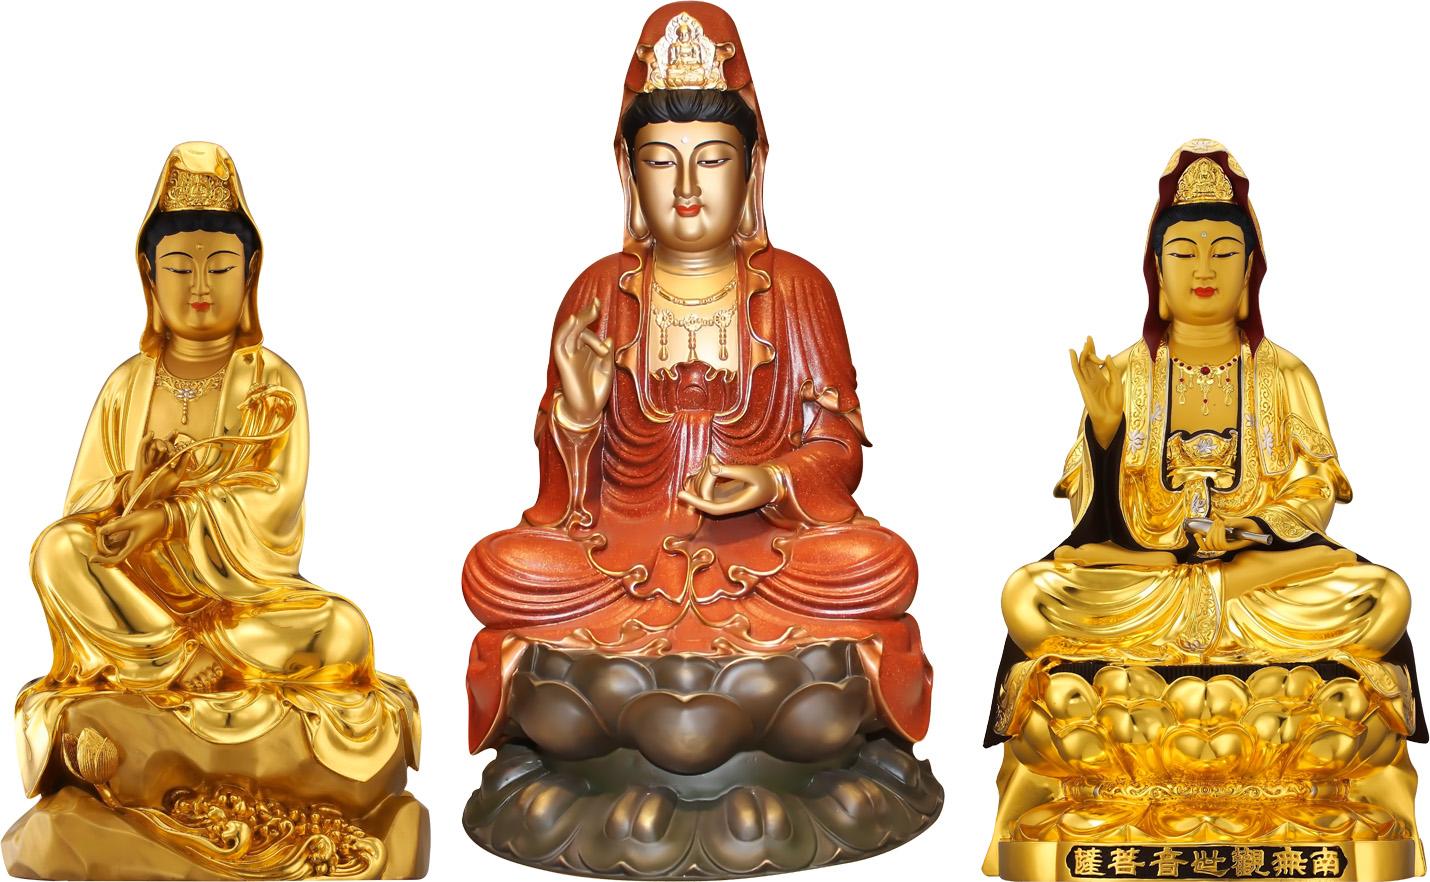 Quan Âm Bồ tát Avalokiteśvara Bodhisattva 觀世音菩薩